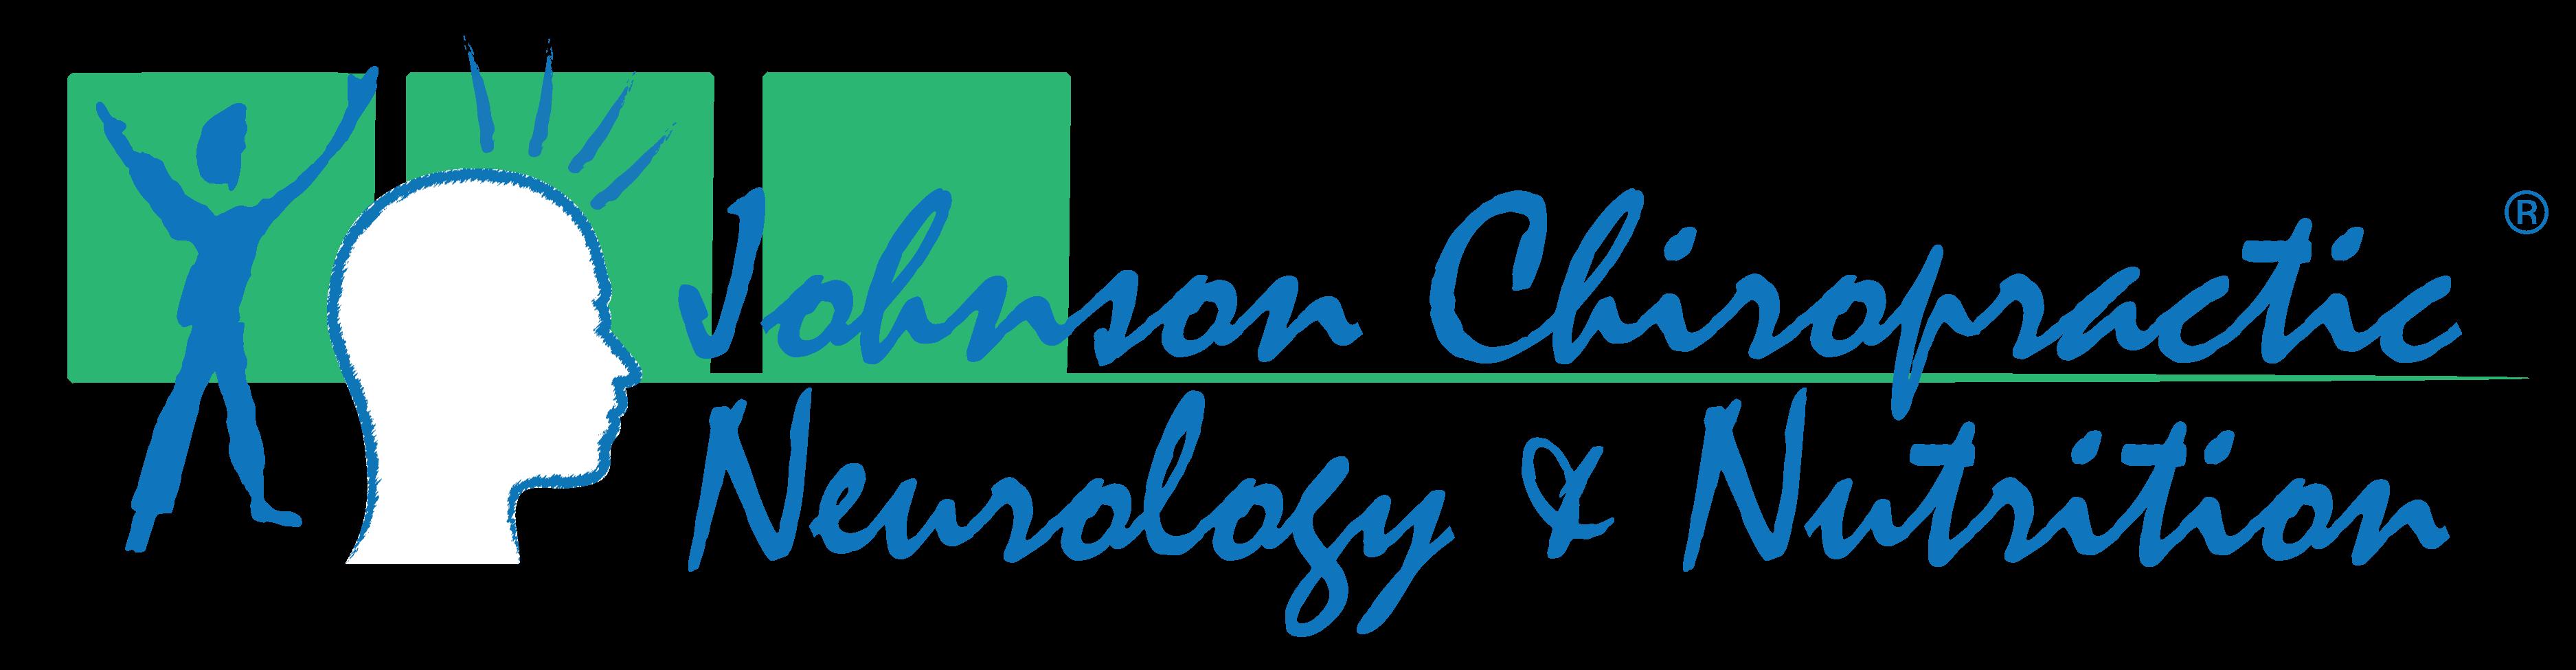 Johnson Chiropractic Neurology & Nutrition